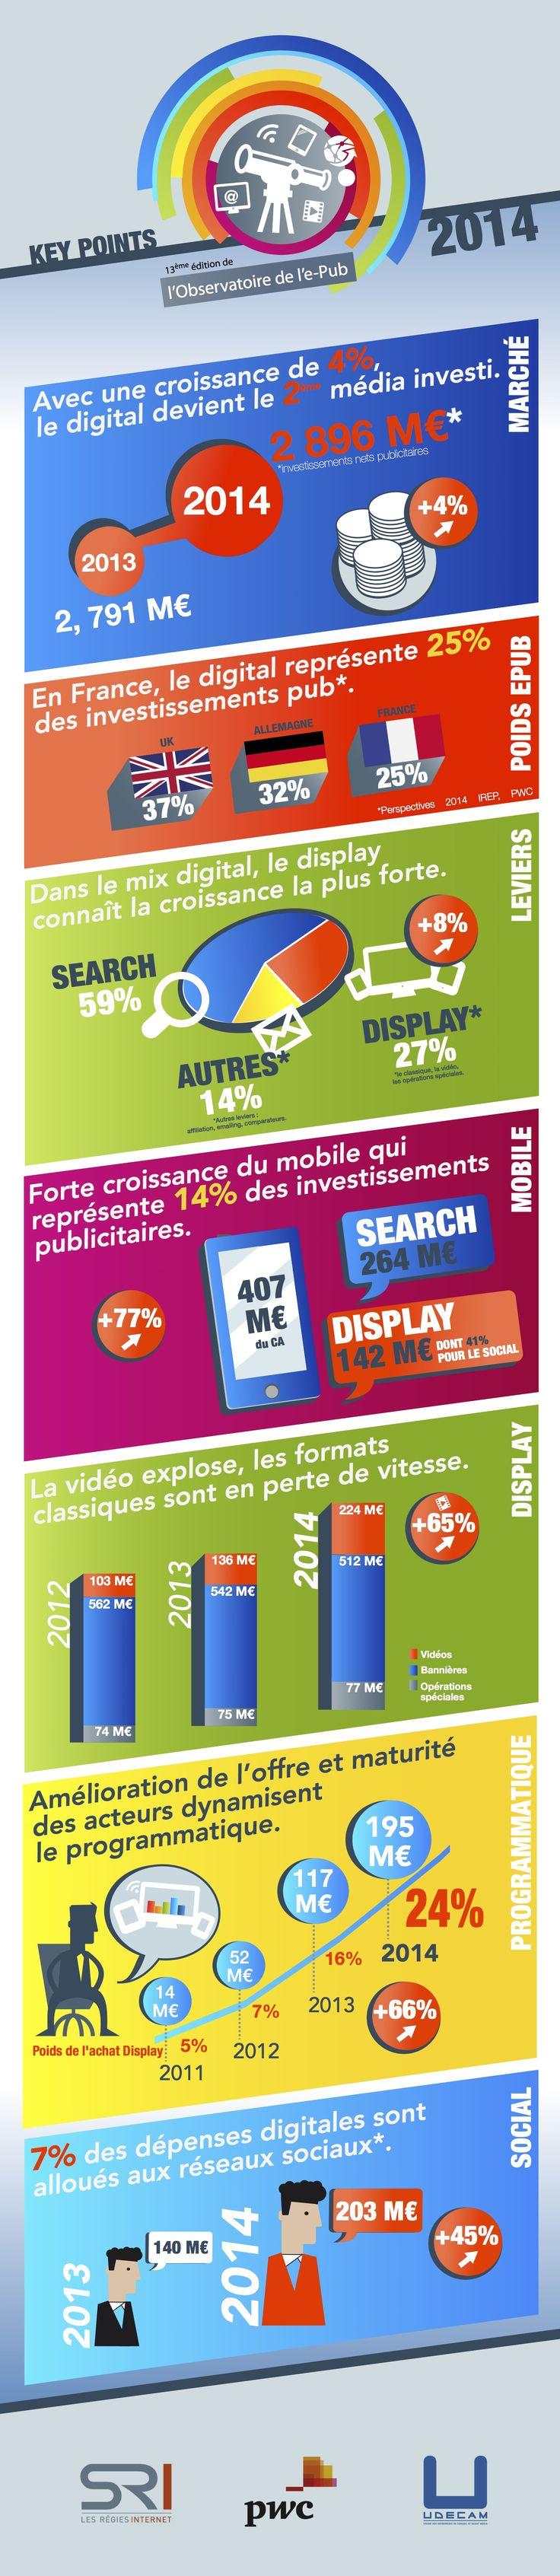 Infographie : 13e Observatoire de l'e-pub PwC (jan. 2015). http://bit.ly/13eObsePub-PwC